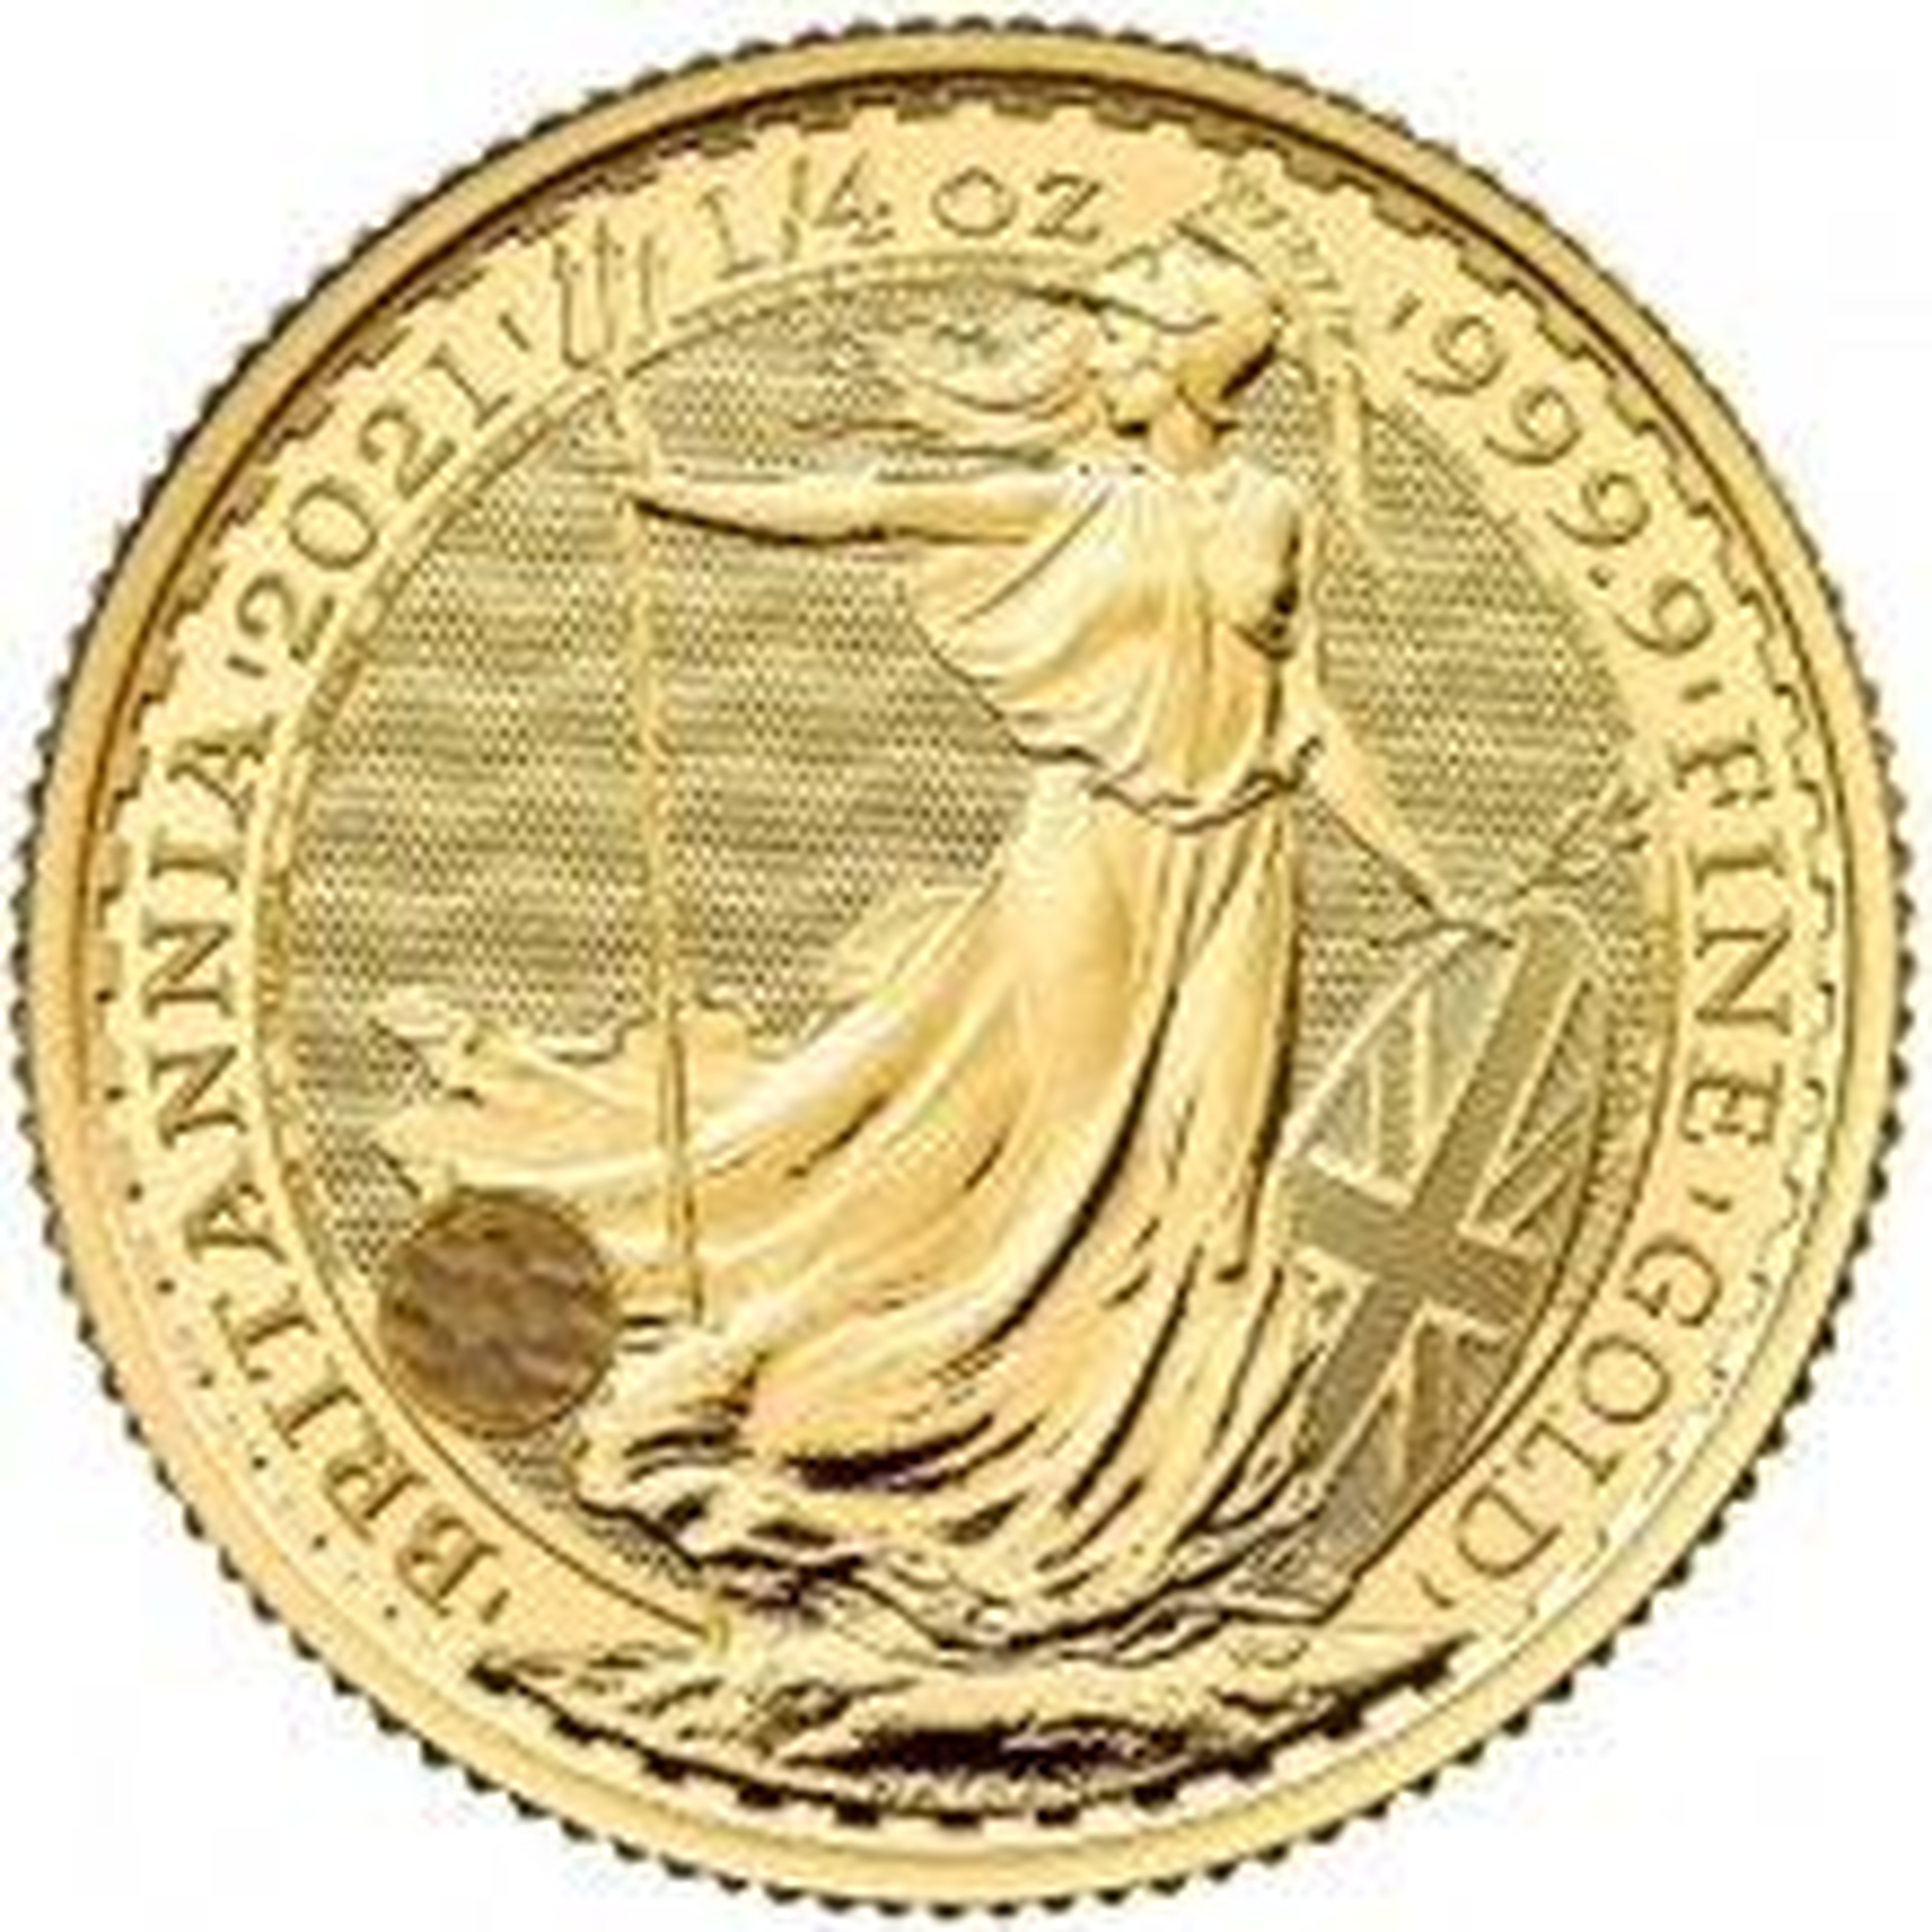 1/4 troy ounce gold coin Britannia 2021